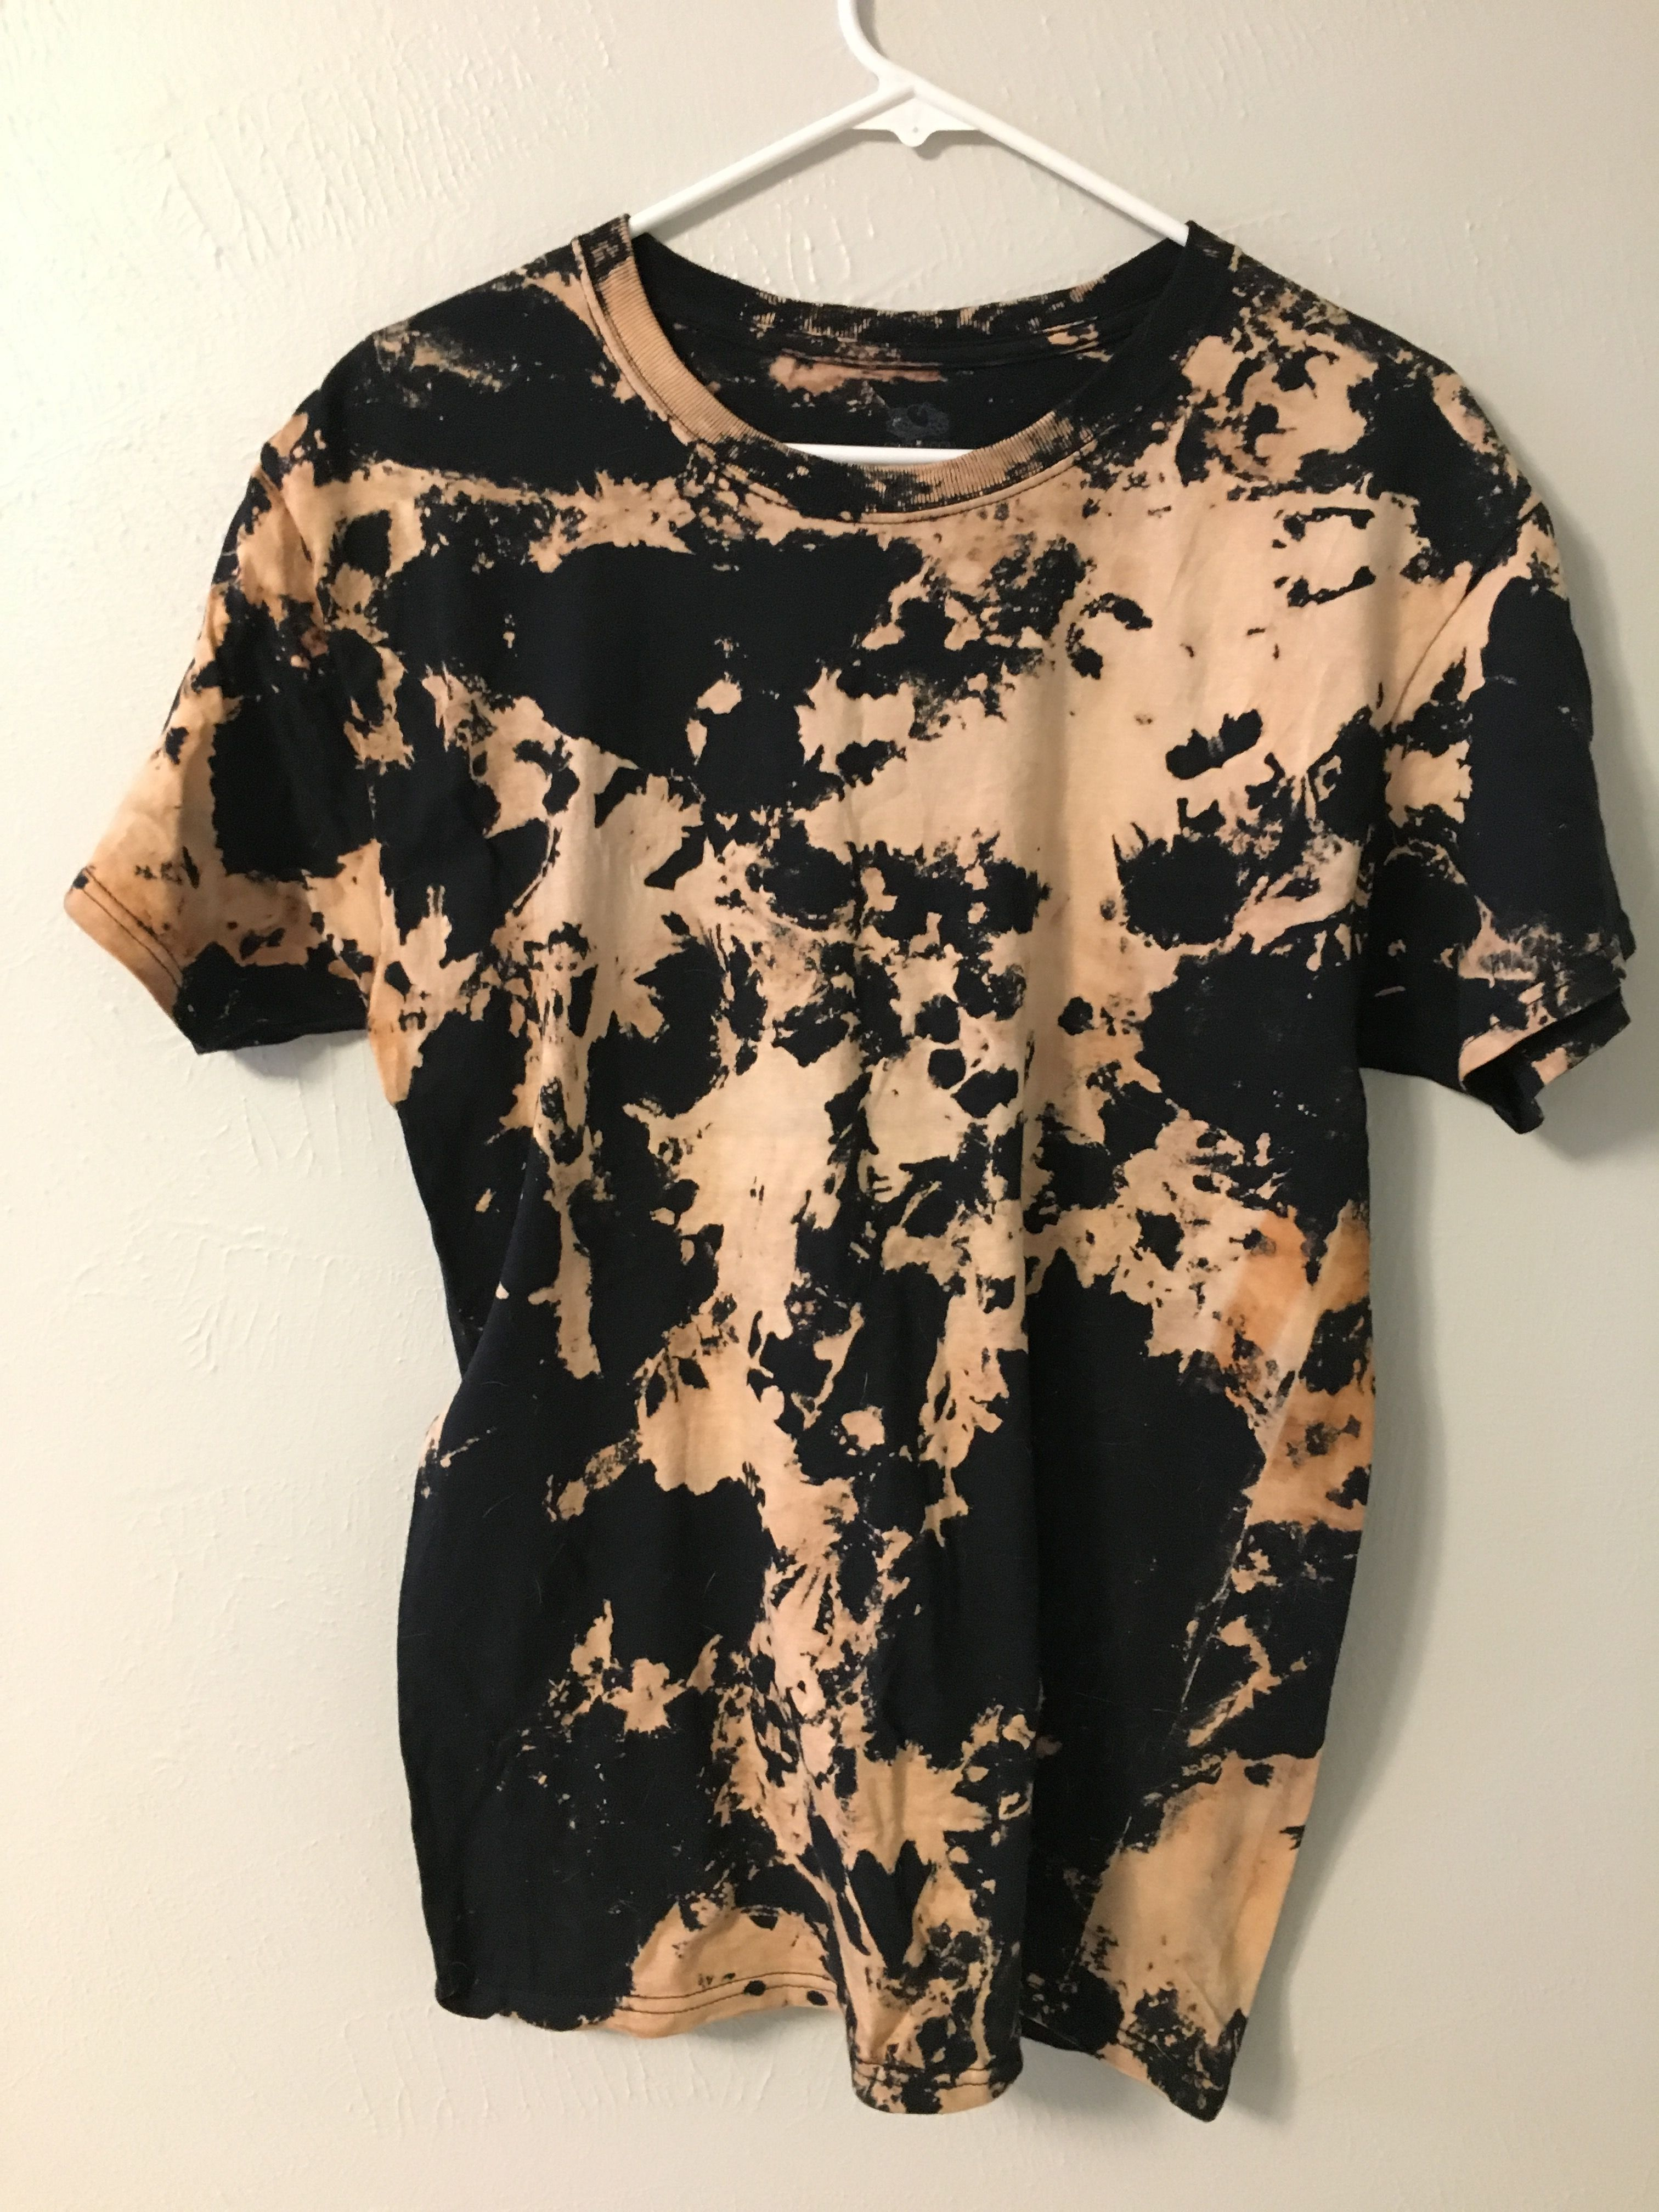 9ed1d65120e19 Bleach shirt crumble method | Make your own clothes in 2019 | Diy ...